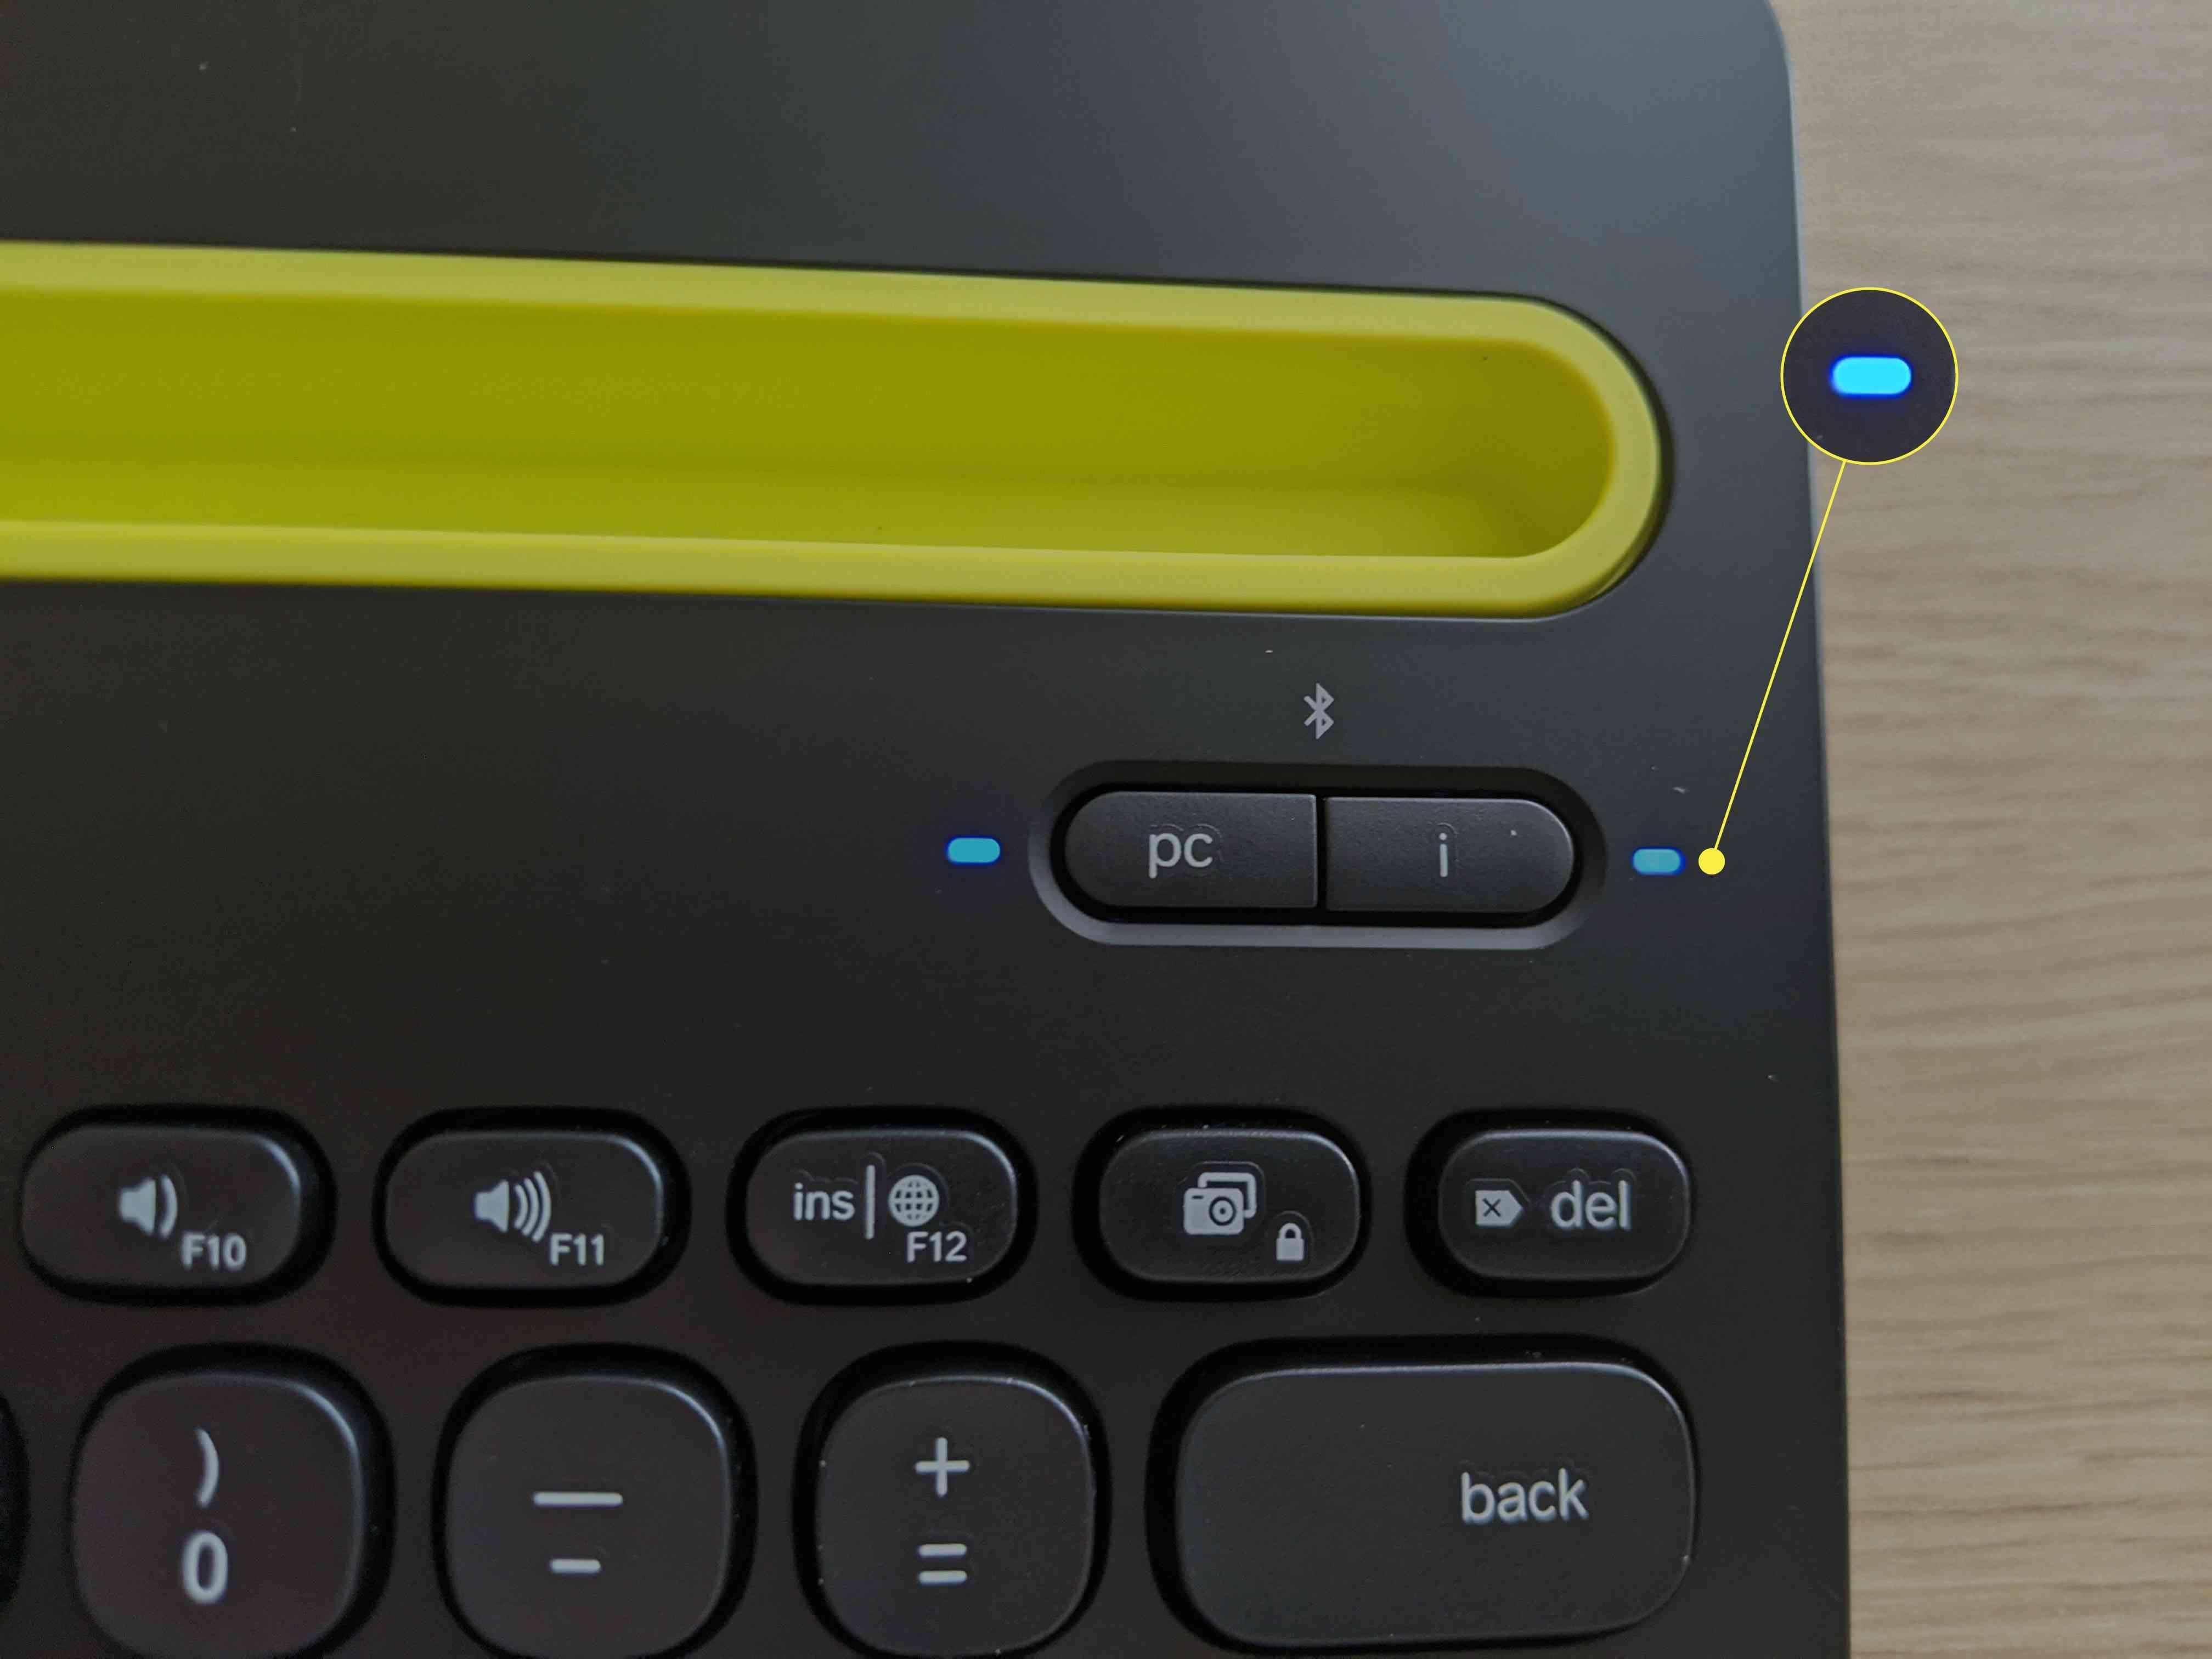 A Bluetooth Logitech keyboard in pairing mode.